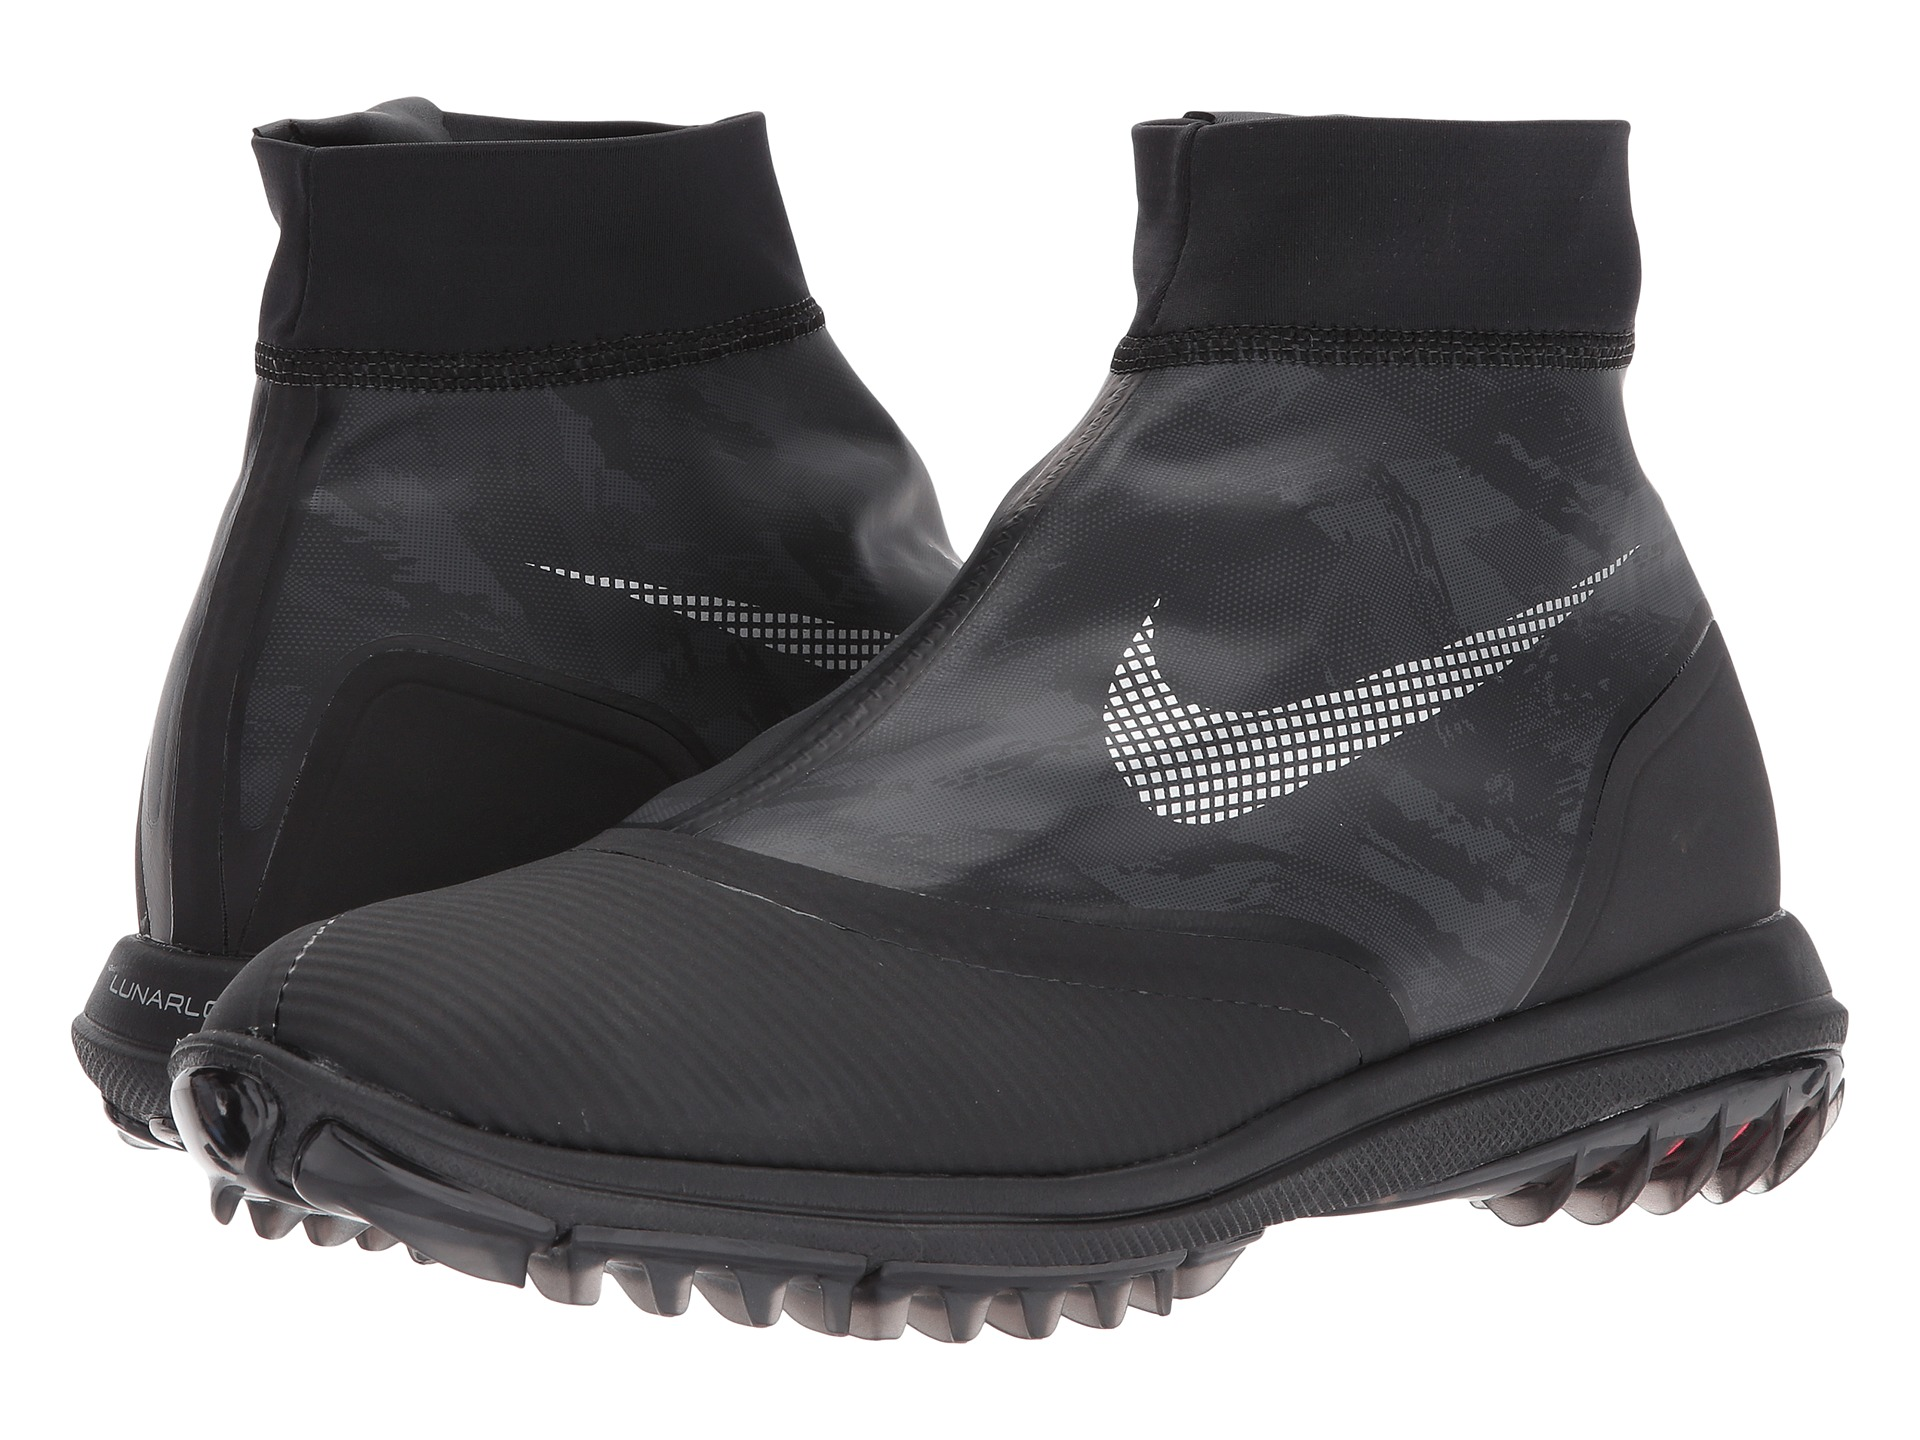 Nike Golf Shoes Zippper